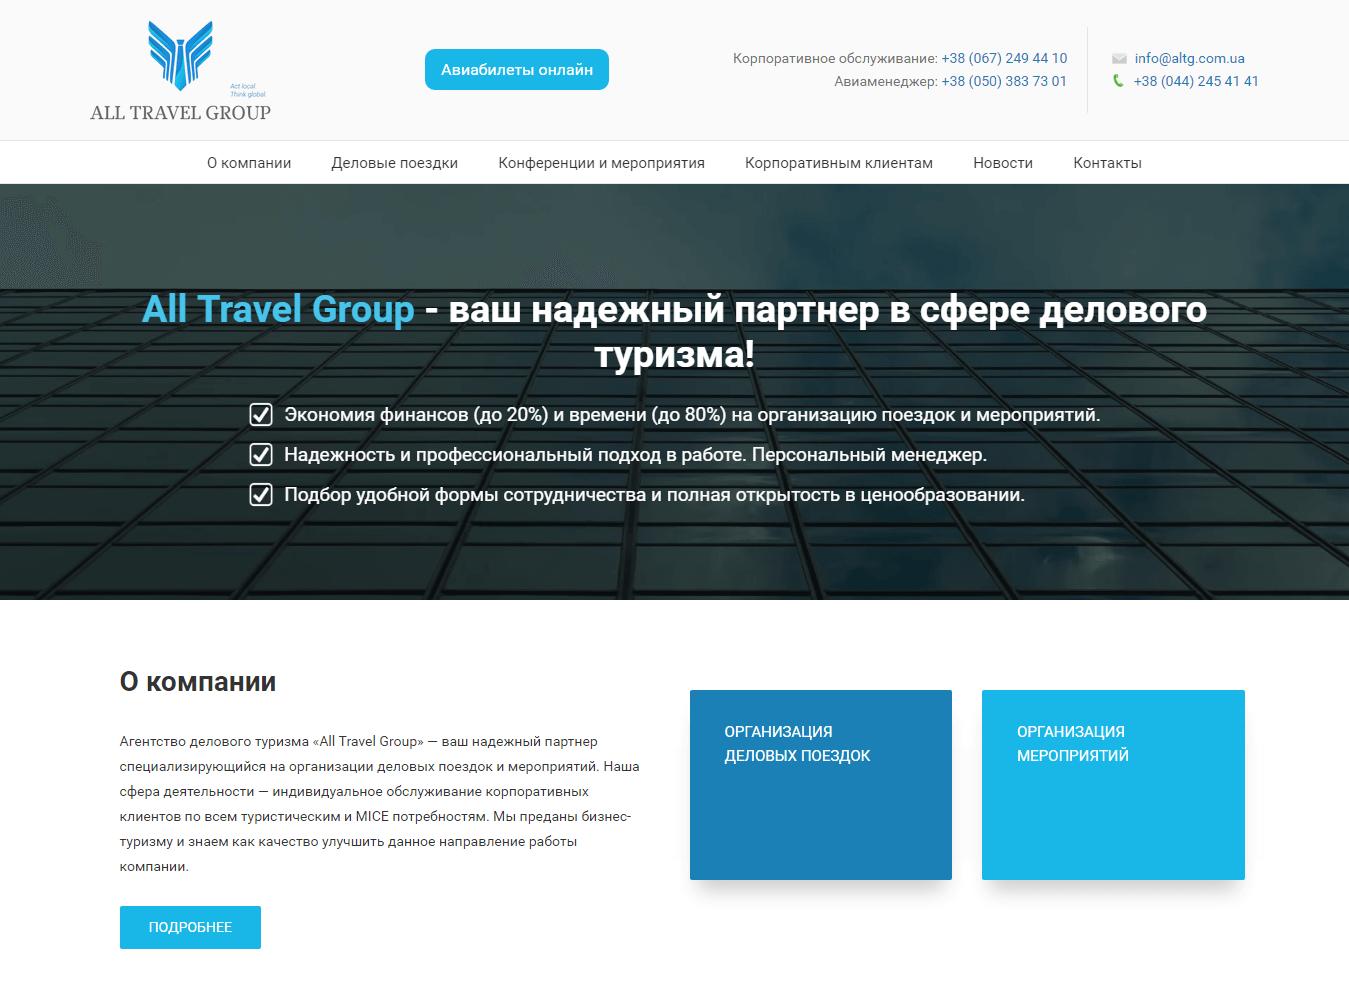 Корпоративный сайт агенства делового туризма